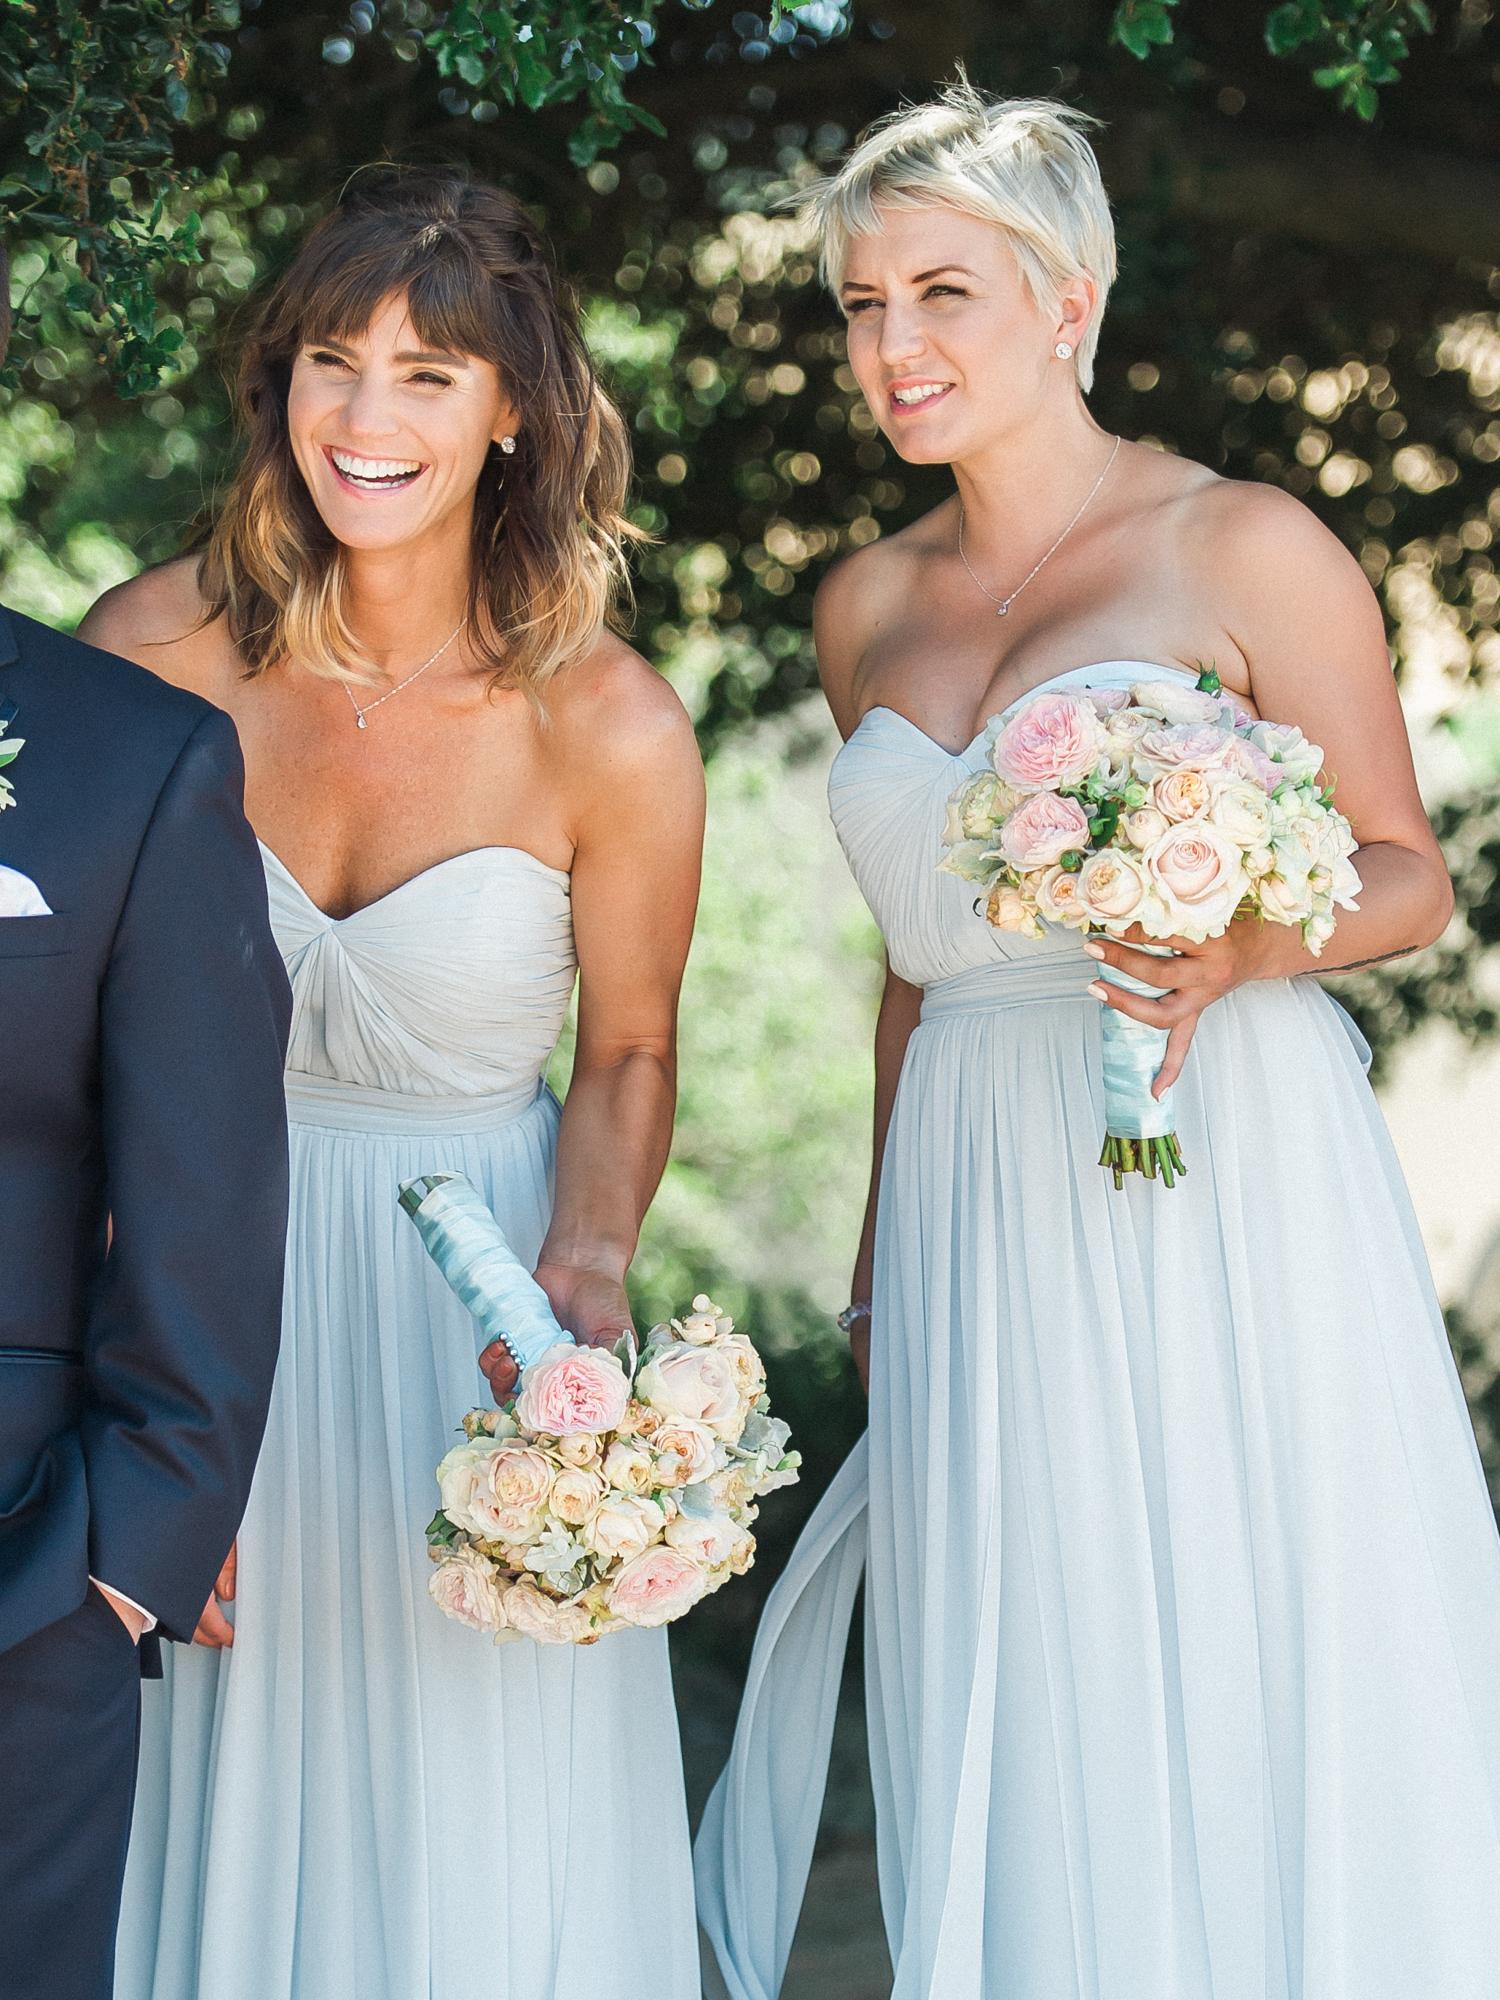 Aimee+Logan_wedding_spp-56.jpg